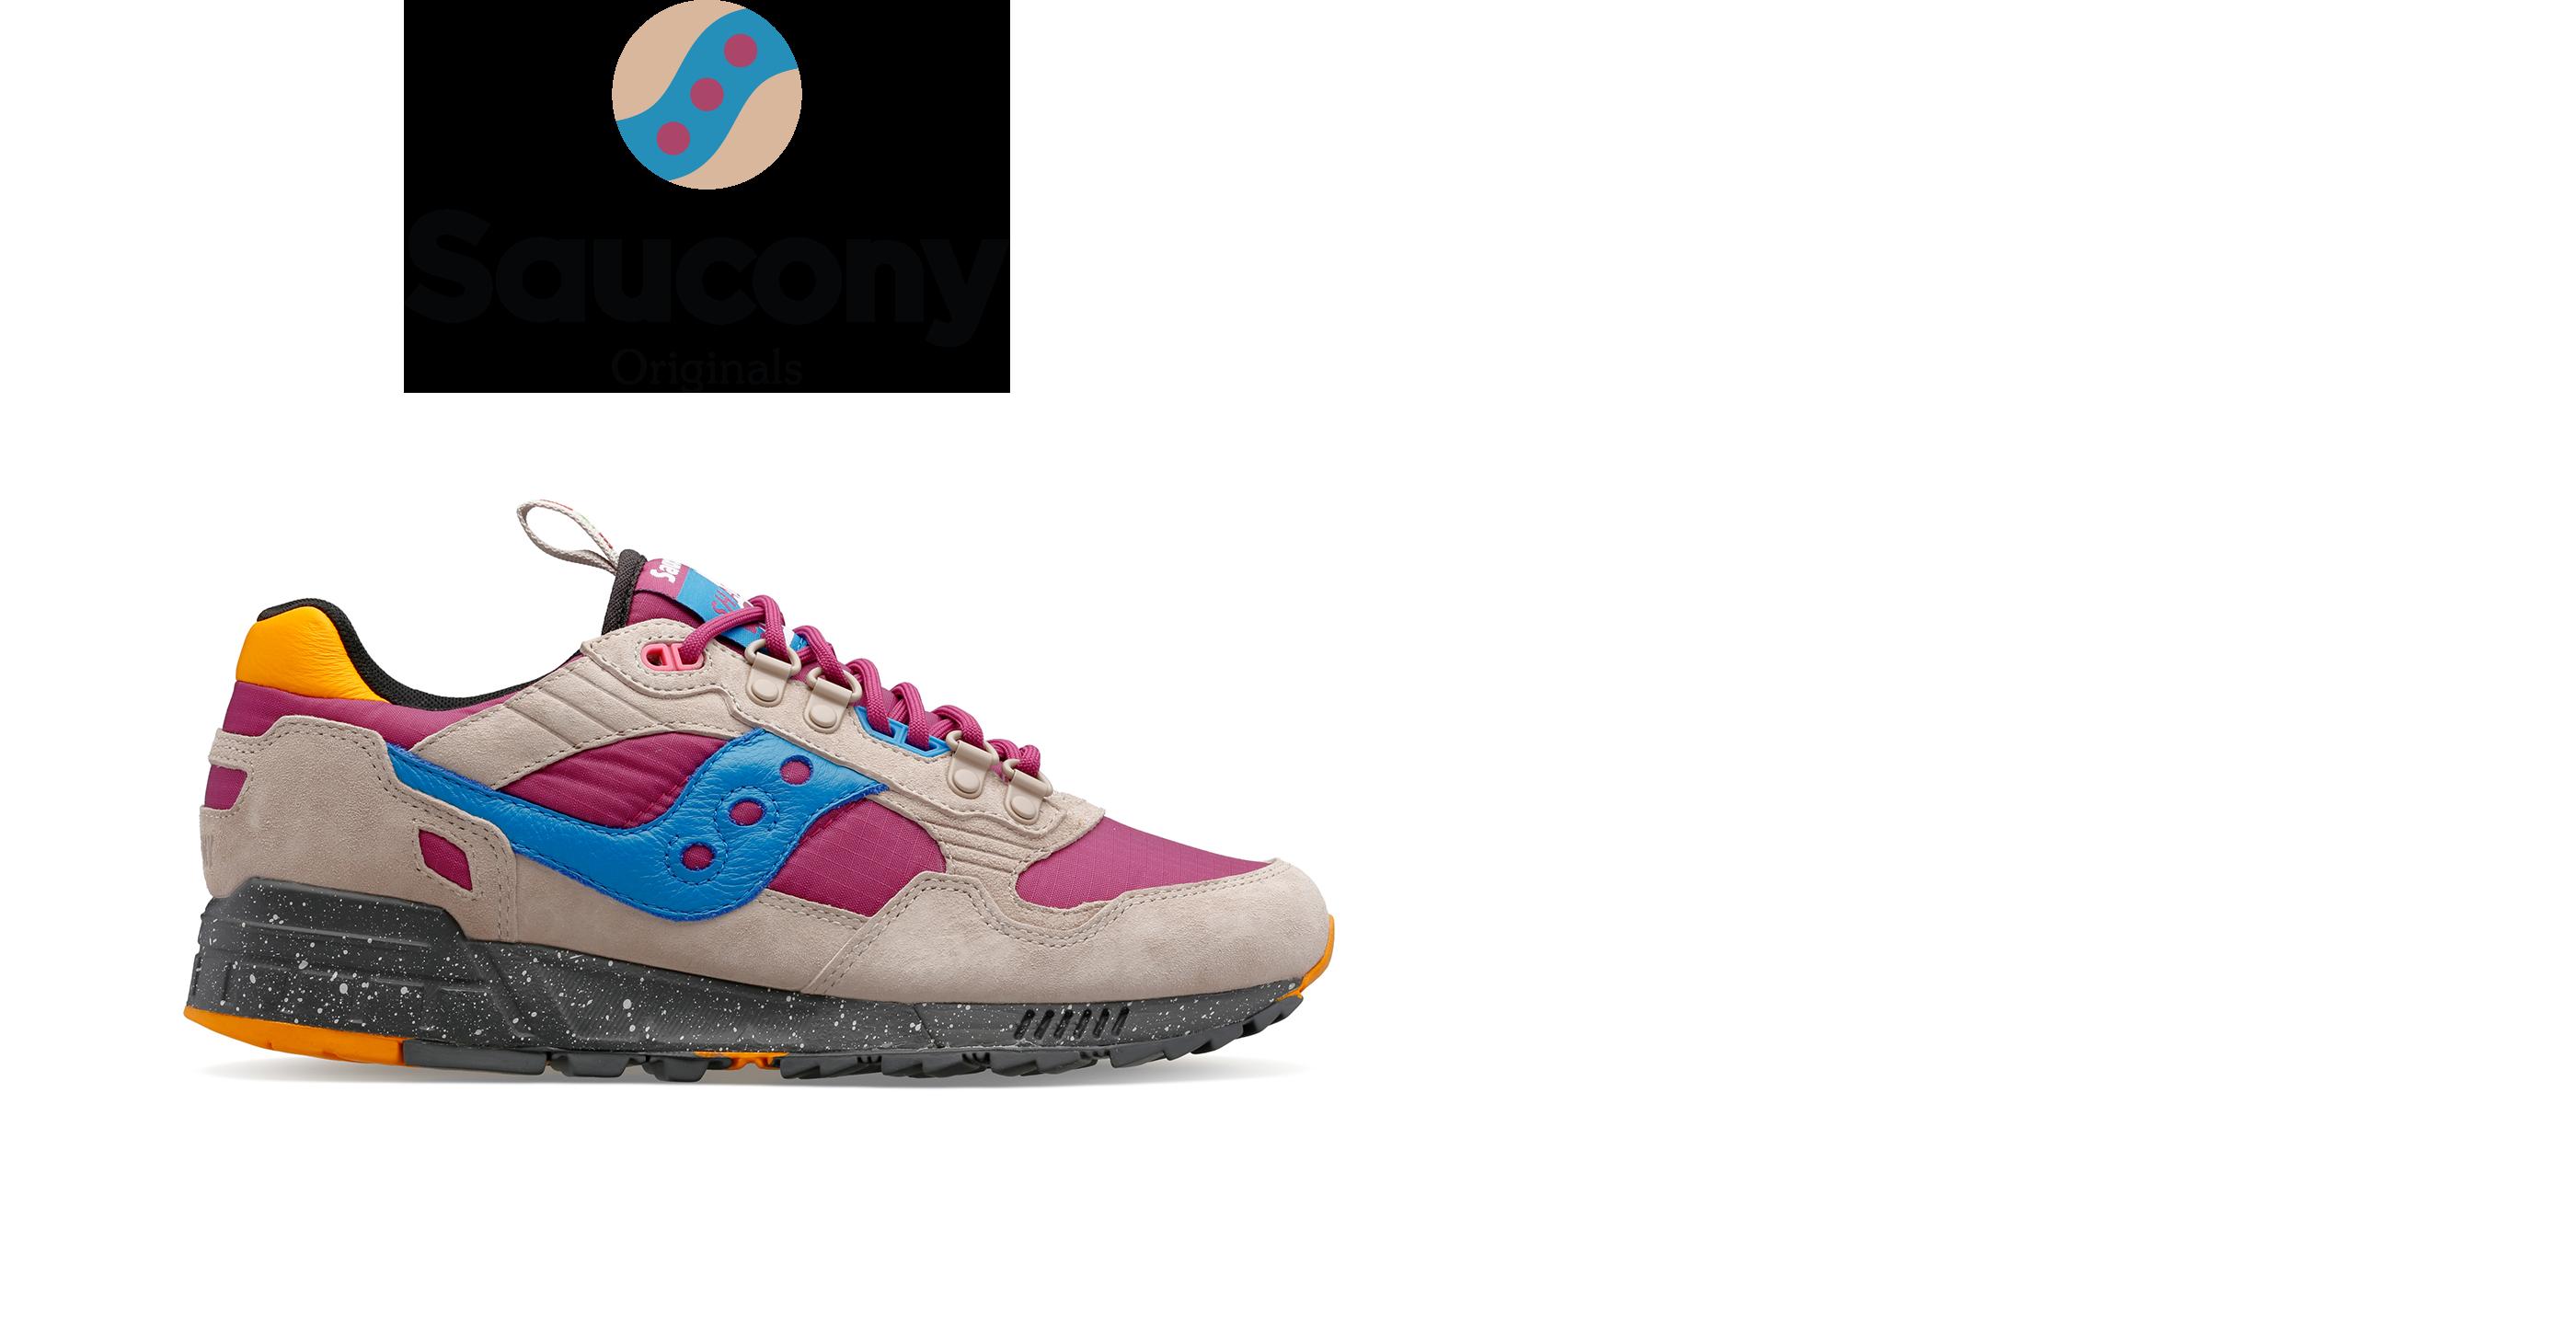 Saucony Shadow 5000 Shoe.